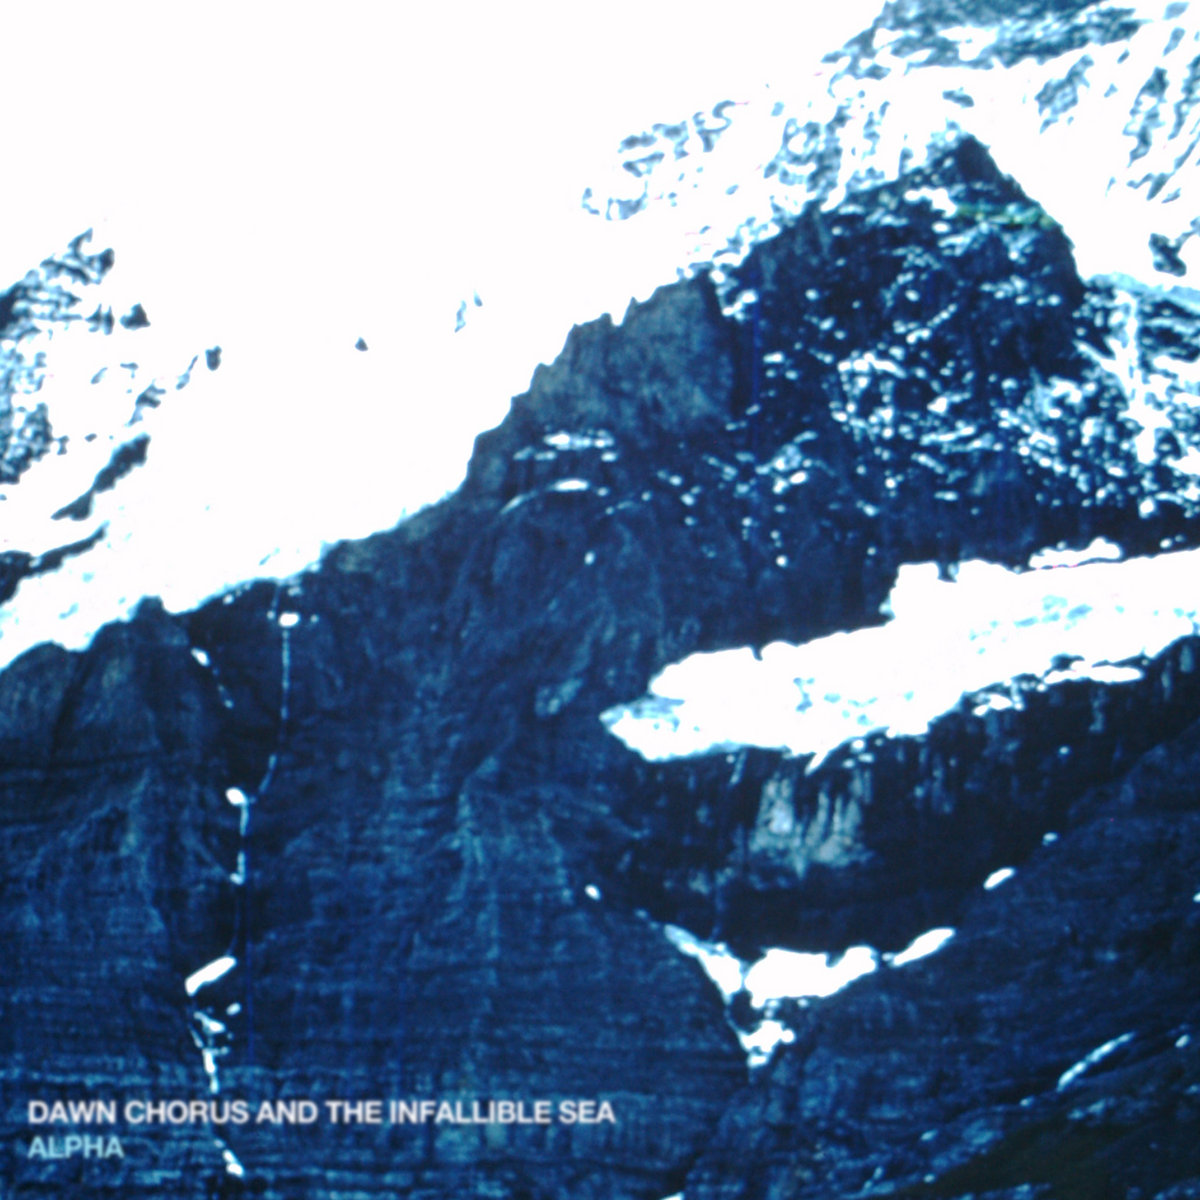 Dawn Chorus and the Infallible Sea — Alpha